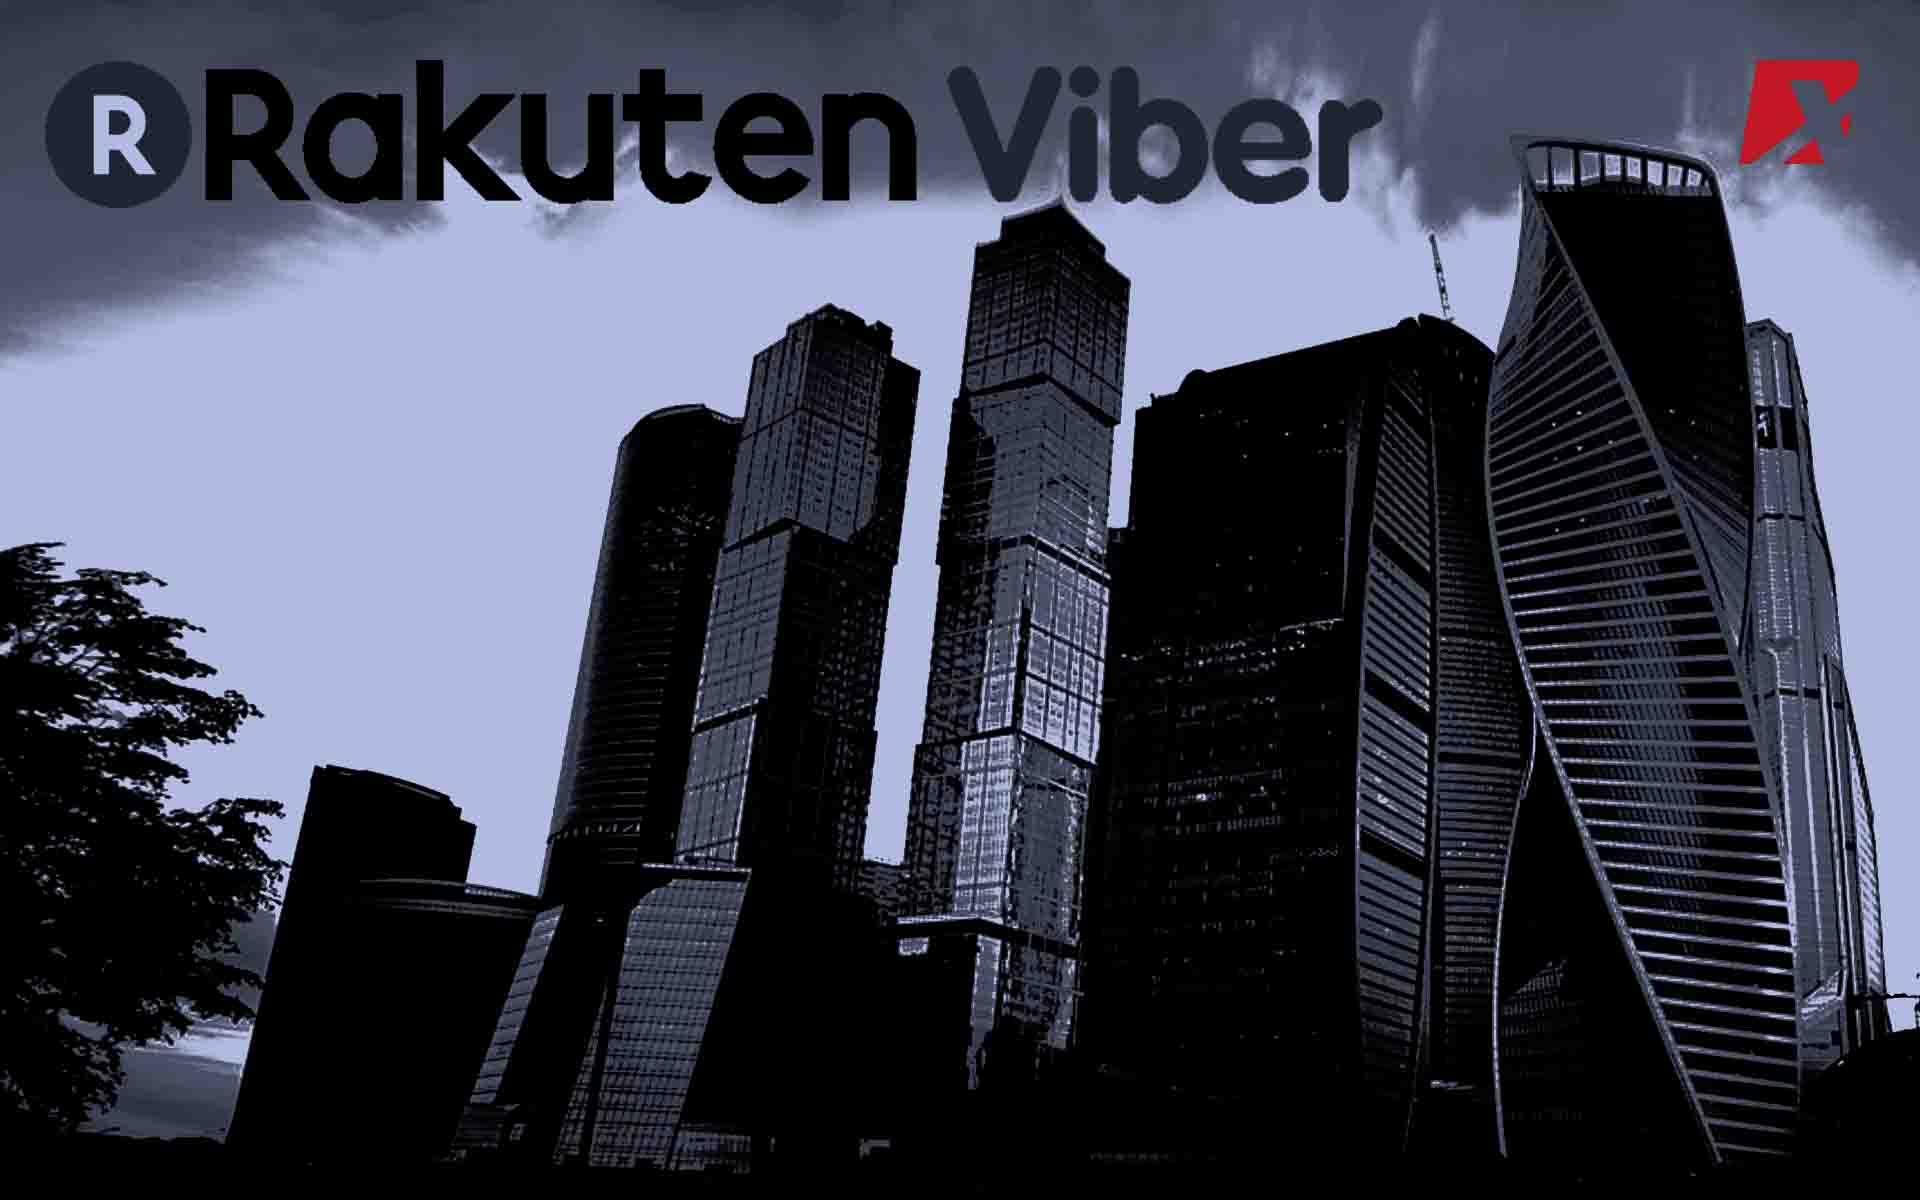 Viber Plans Launch of Rakuten Coin In Russia Next Year